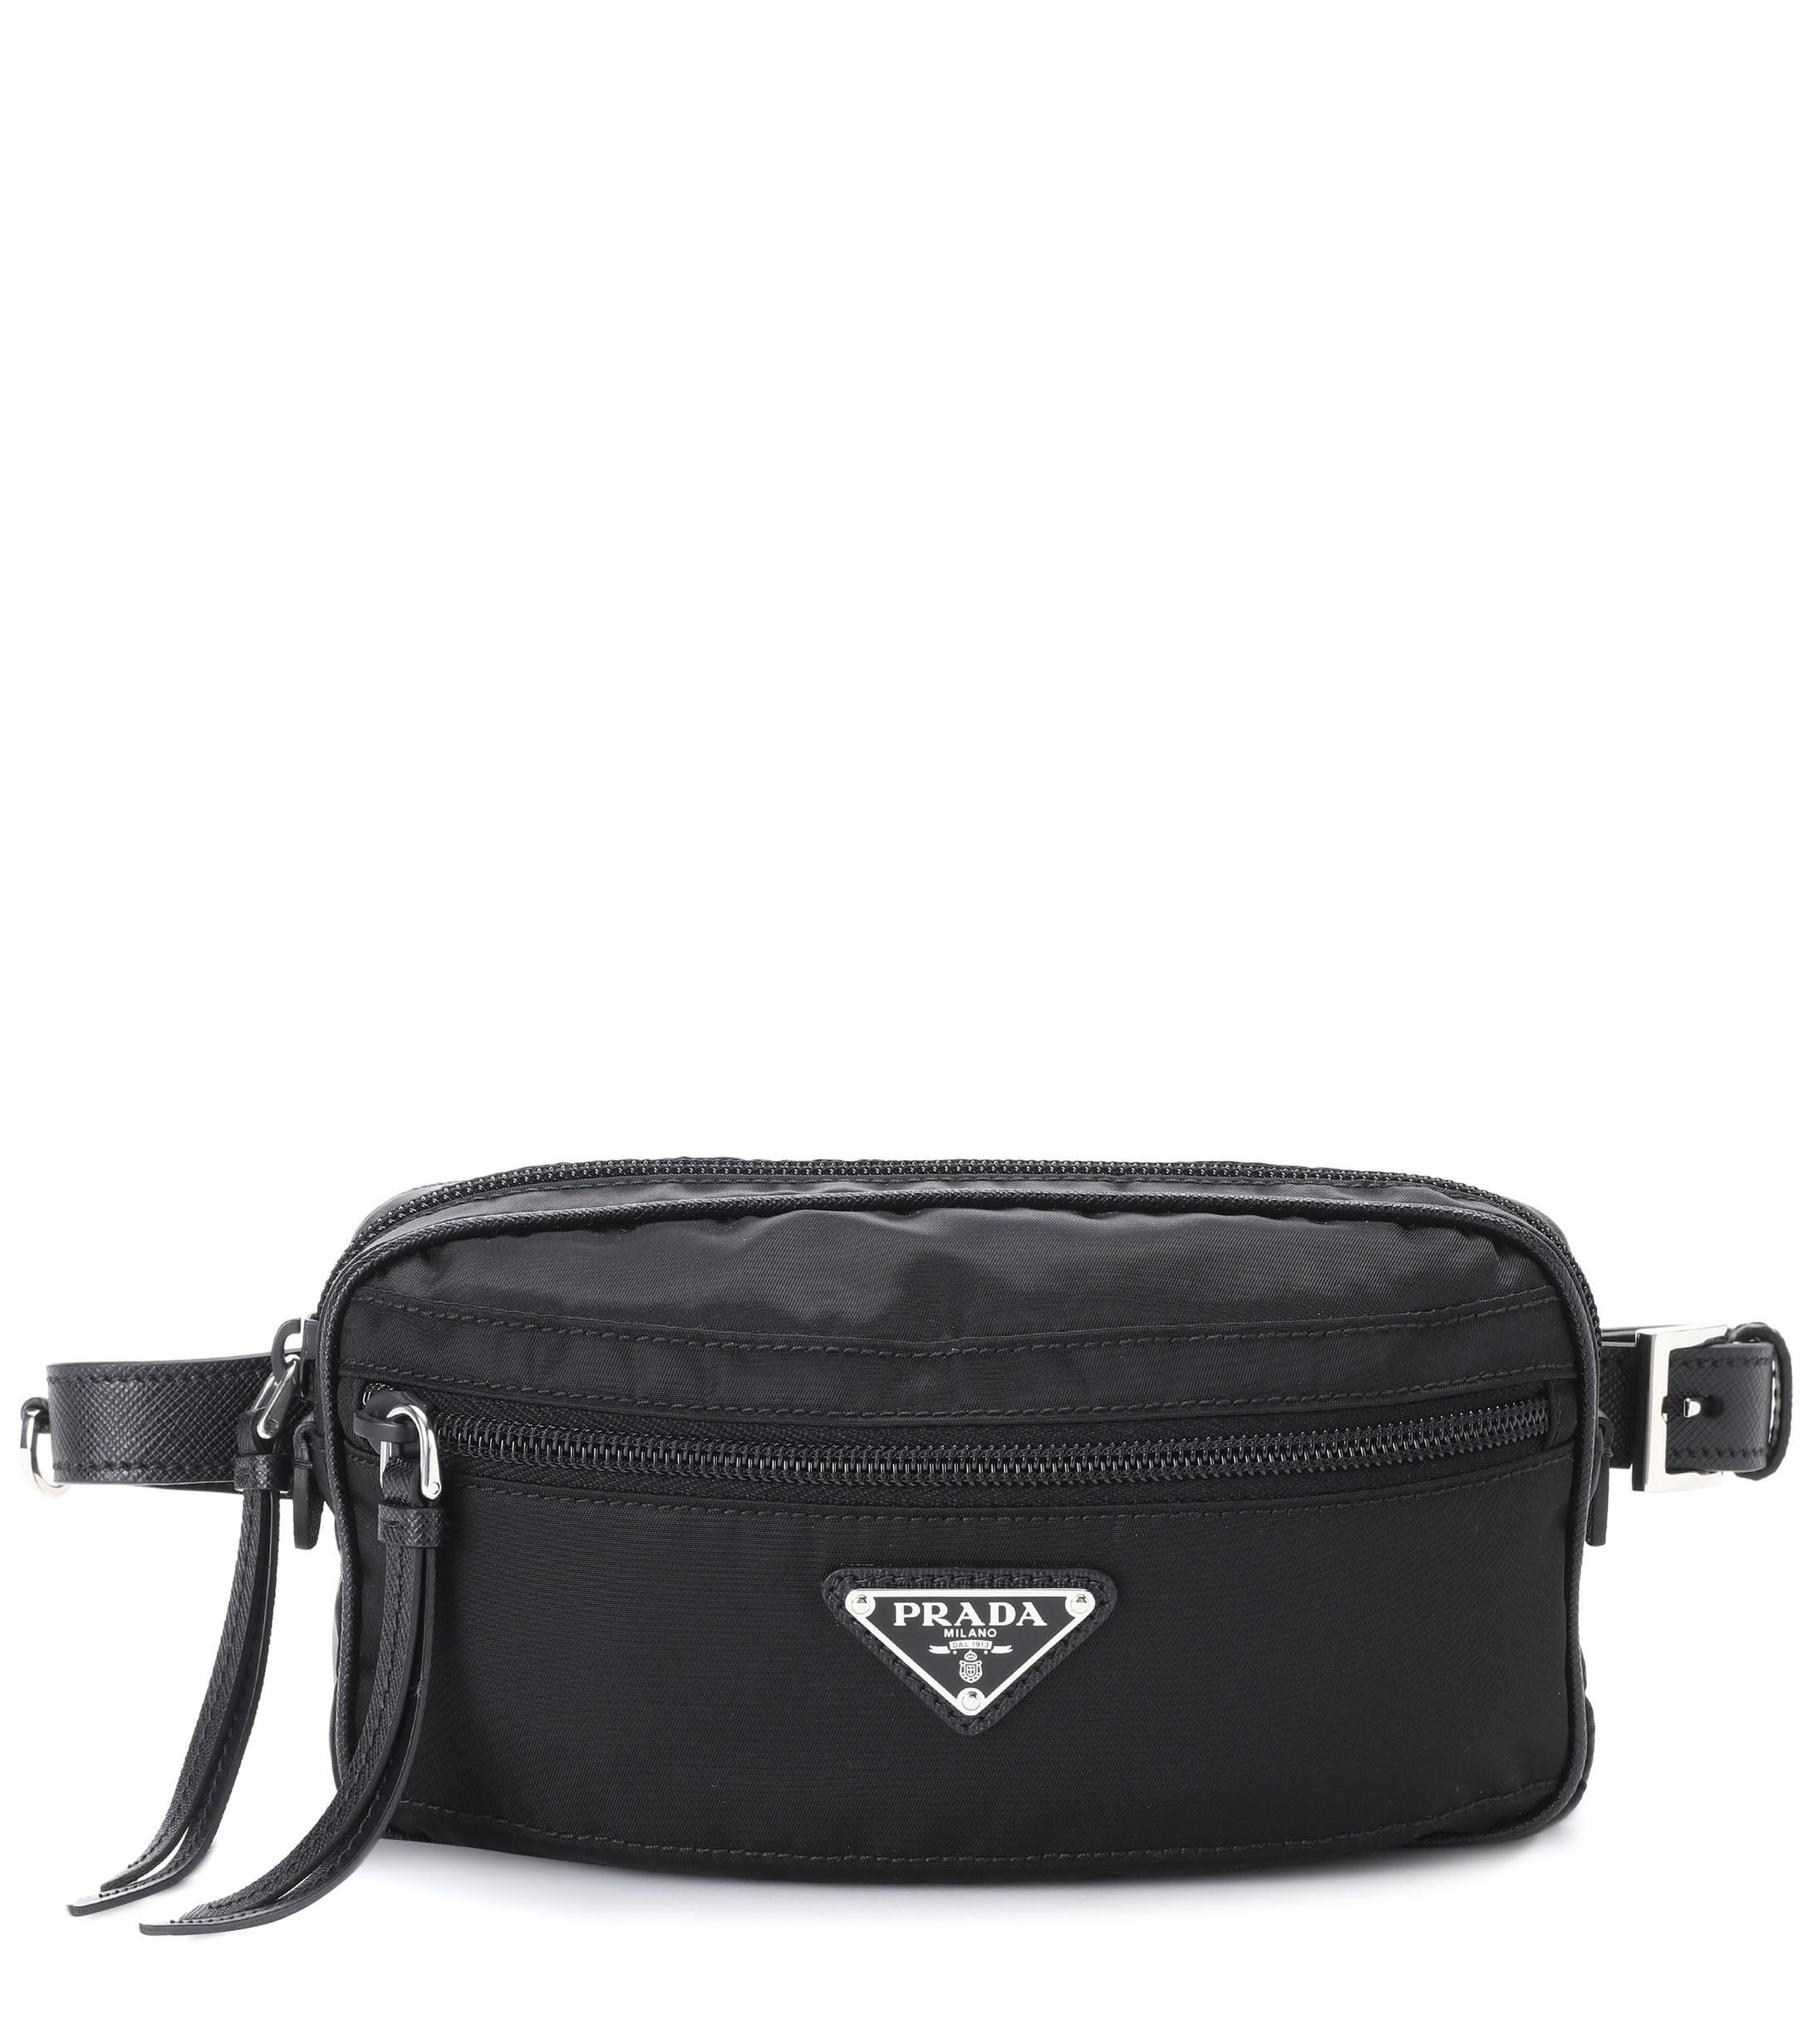 Lyst - Prada Leather-trimmed Belt Bag in Black - Save 10% 2233e6cd1ce62